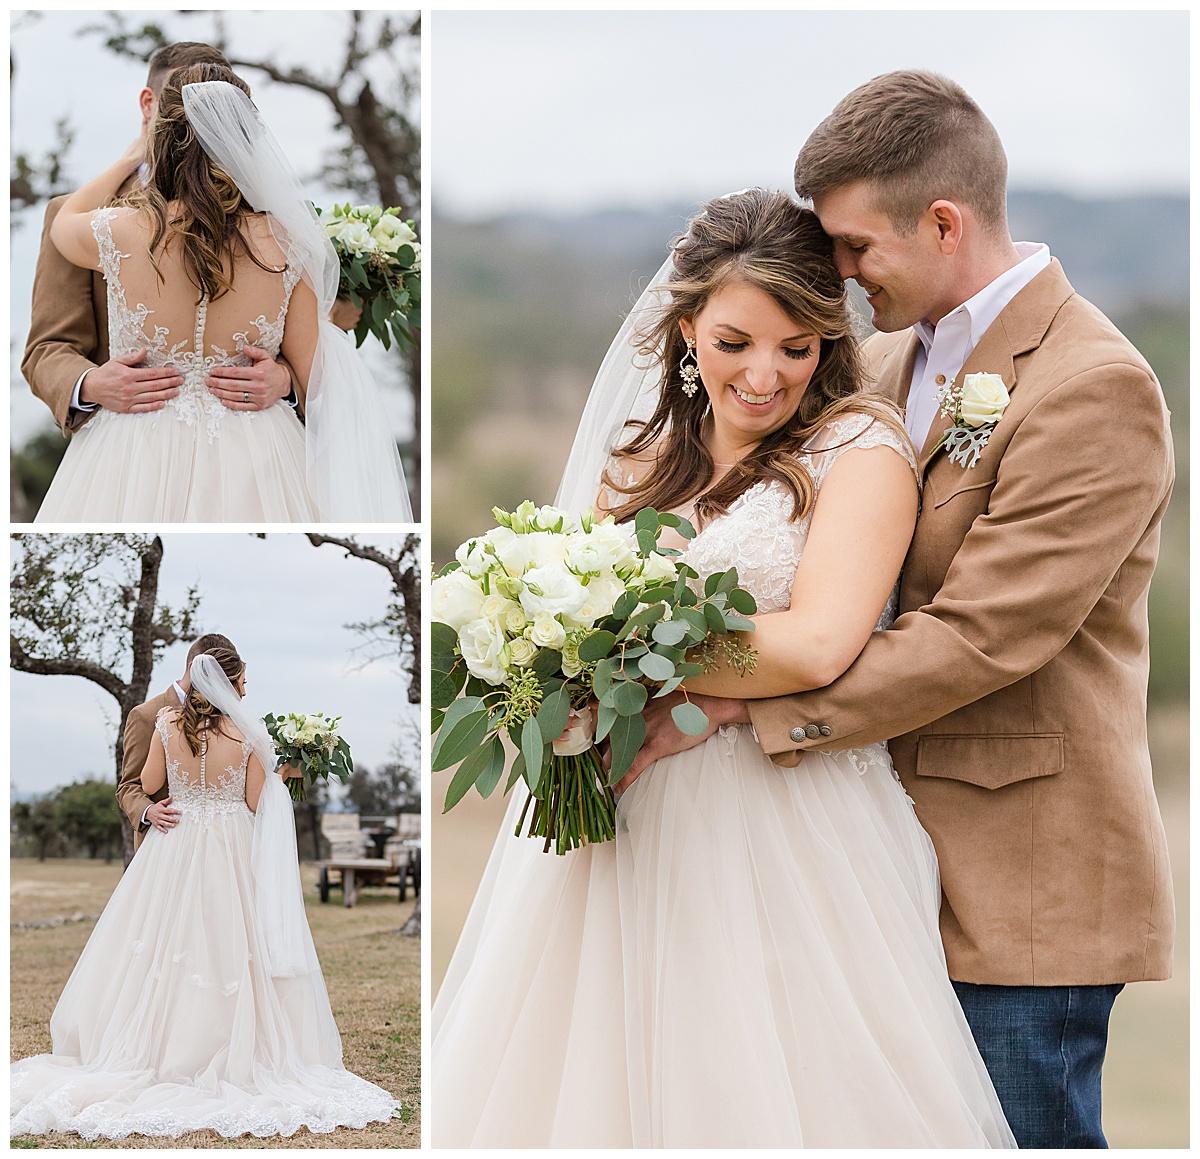 Wedding-Photographer-Texas-Hill-Country-Happy-H-Ranch-Comfor-Texas-Carly-Barton-Photography_0047.jpg